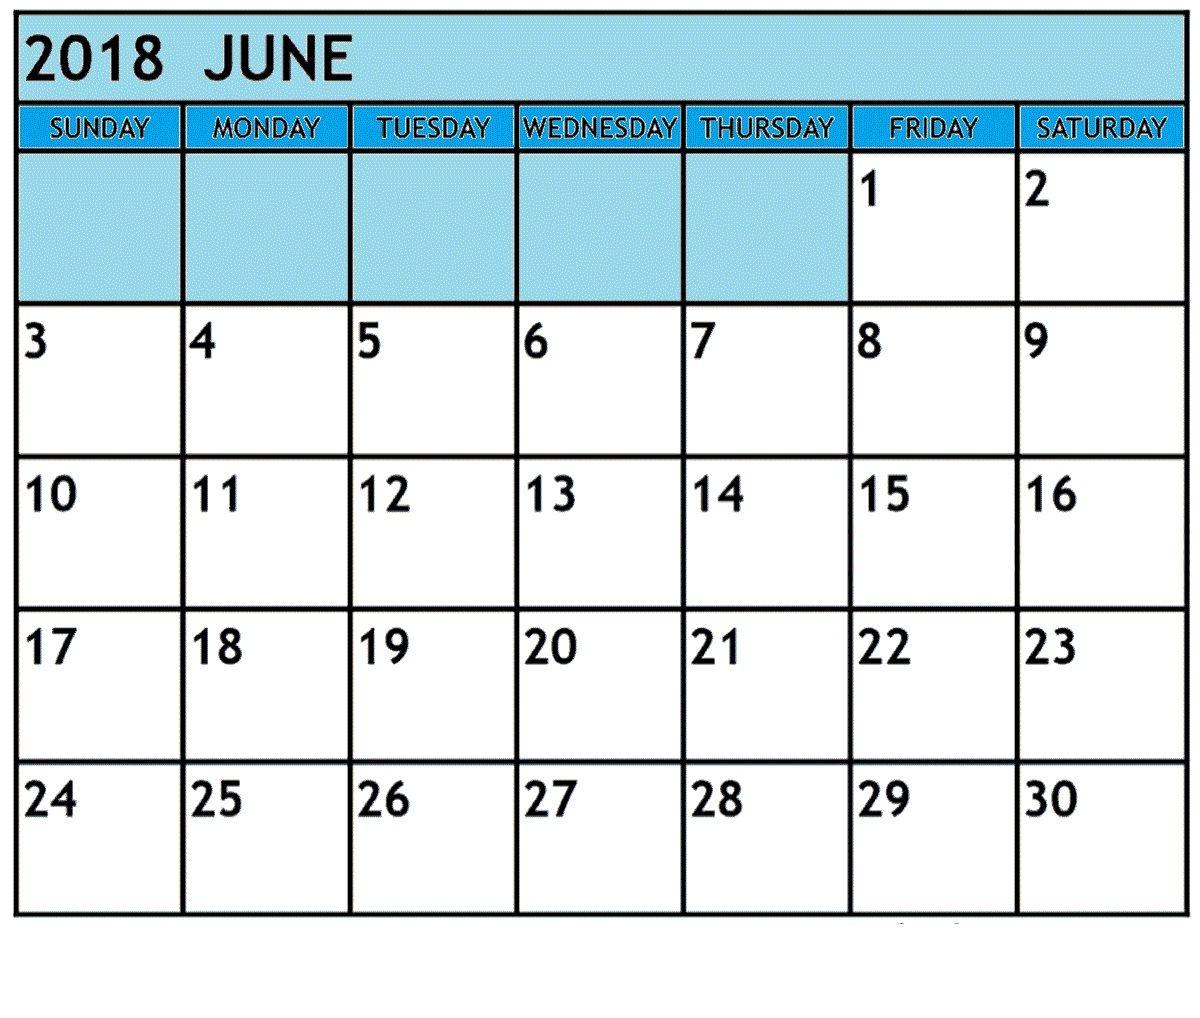 June 2018 Waterproof Calendar November calendar, Monthly